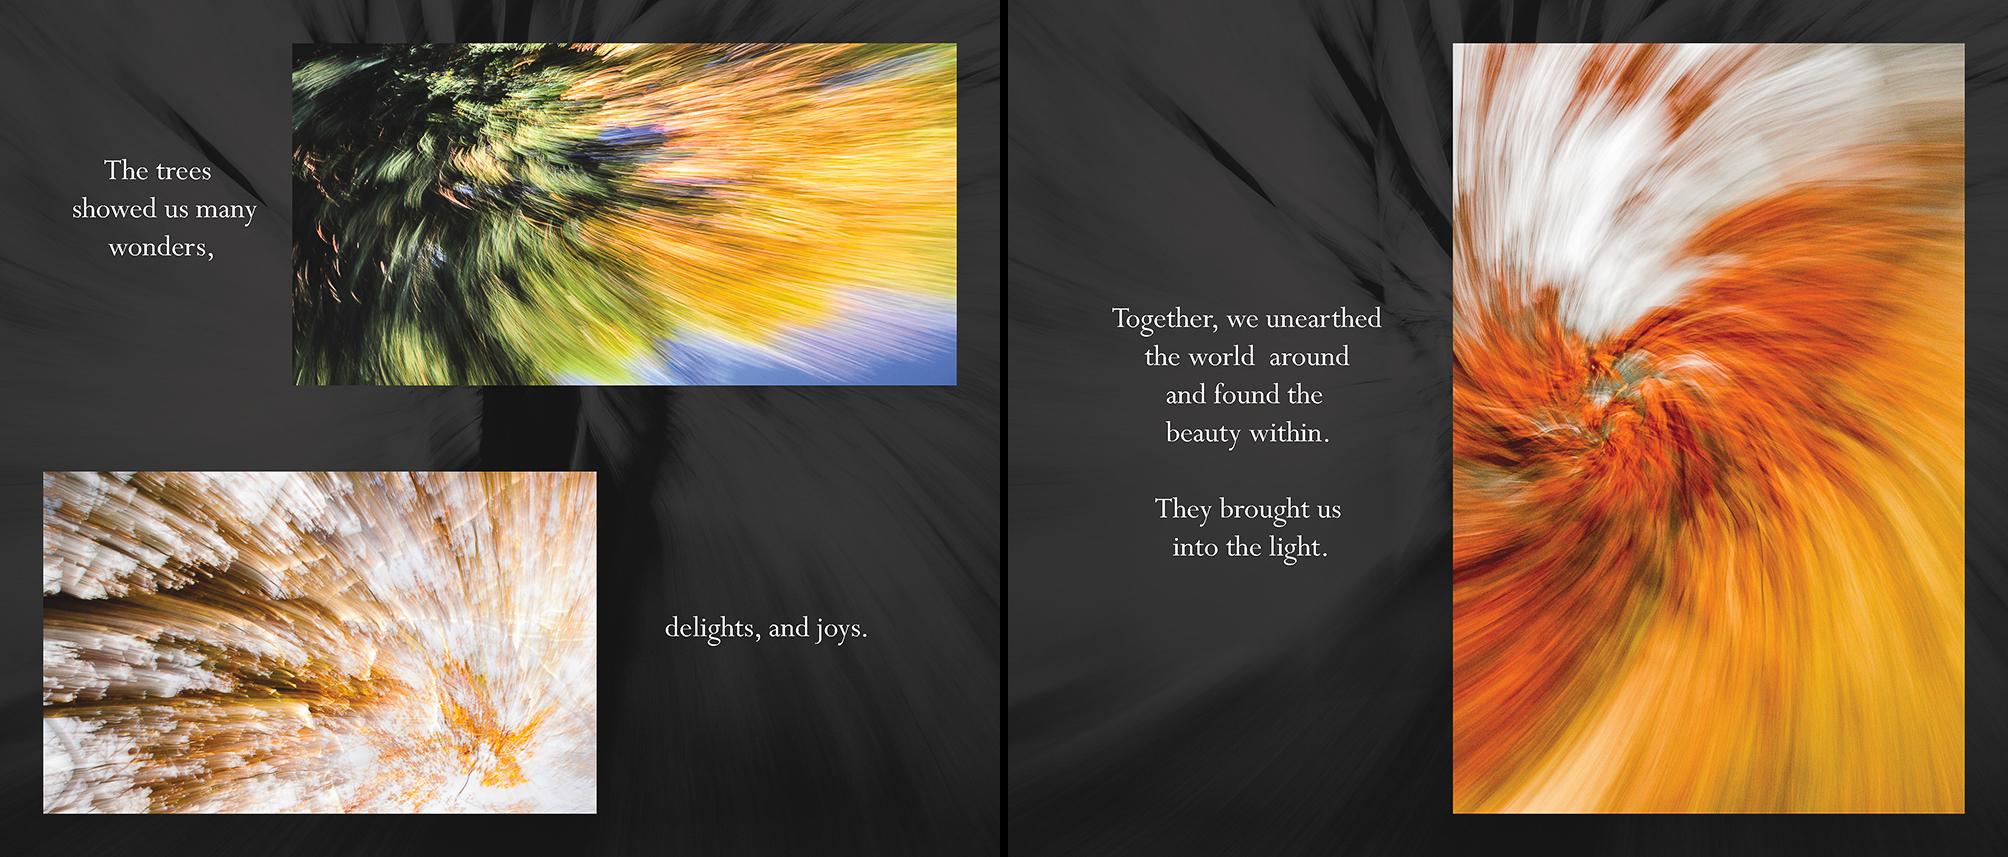 Carlin - Tree Whispers v2012_Page_09-10.jpg